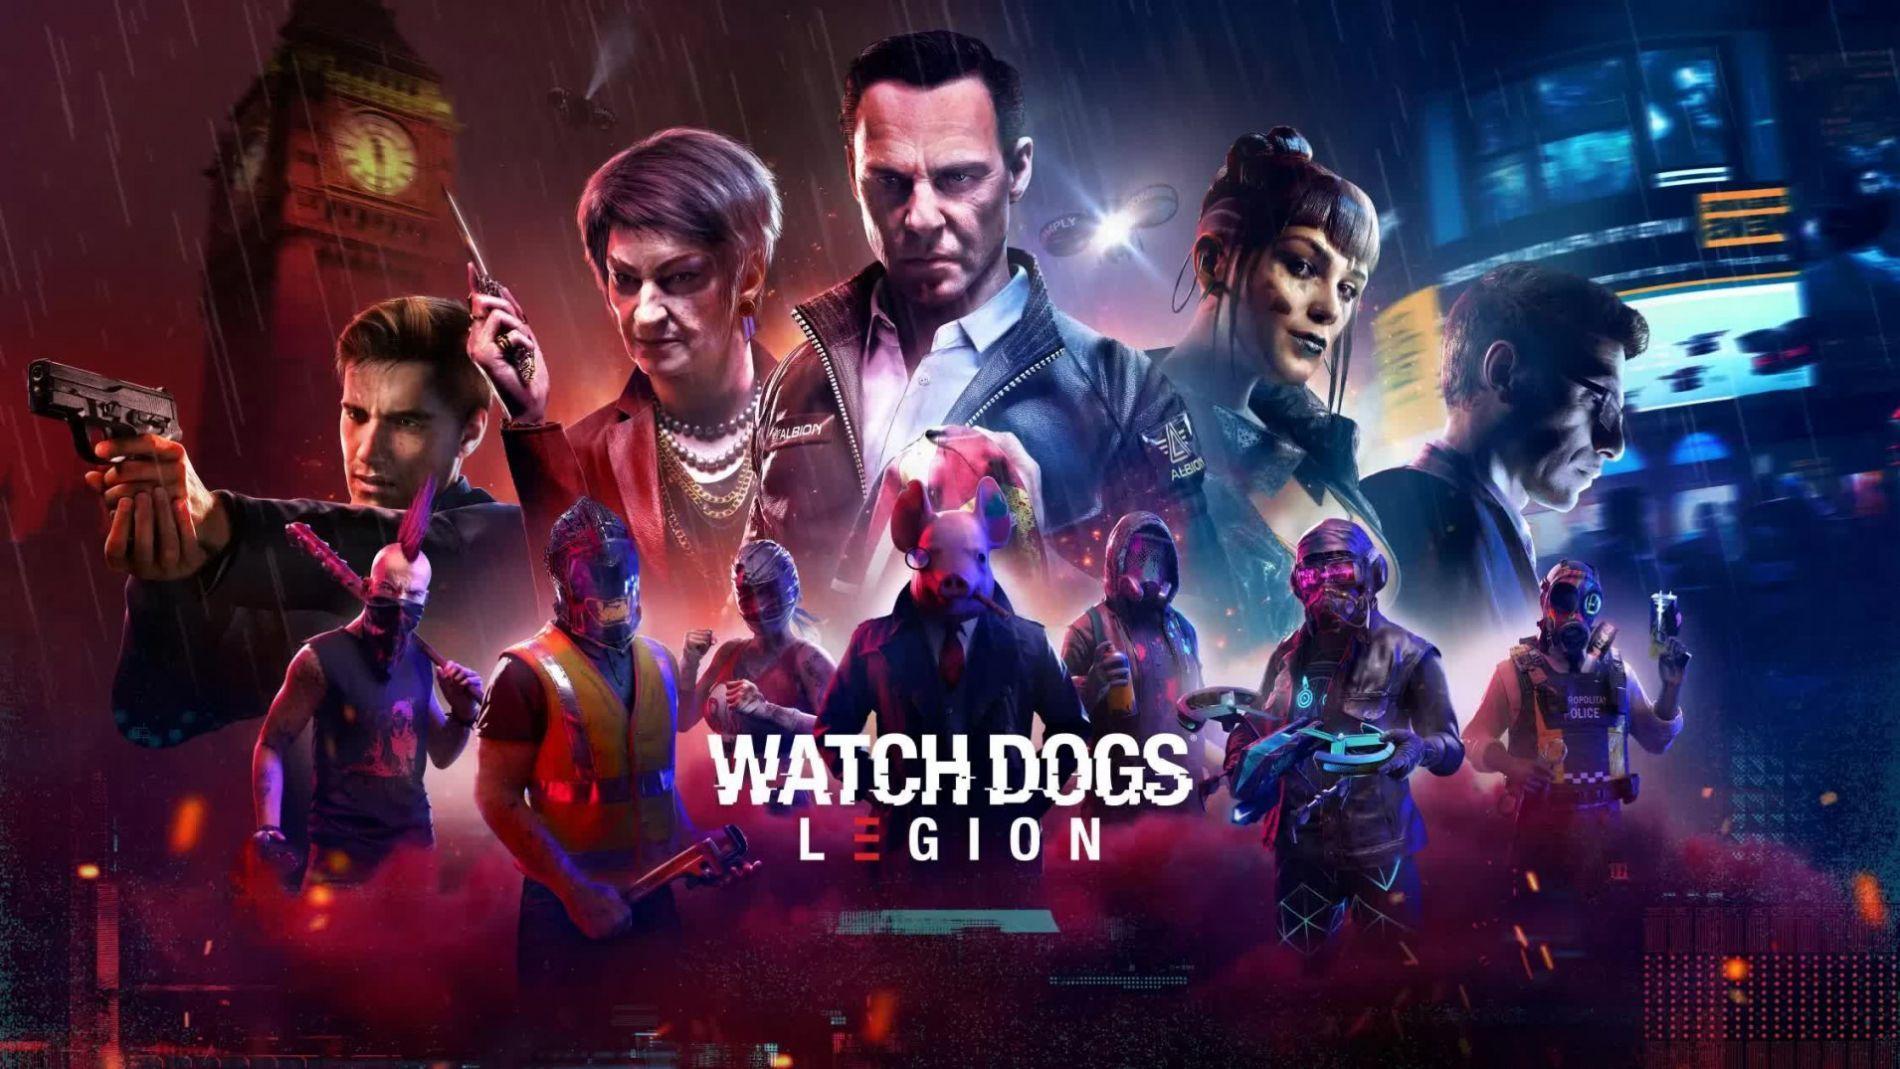 Three songs by TV Noise, Curbi & Daniel Blume in Ubisoft's Watch Dogs Legion!